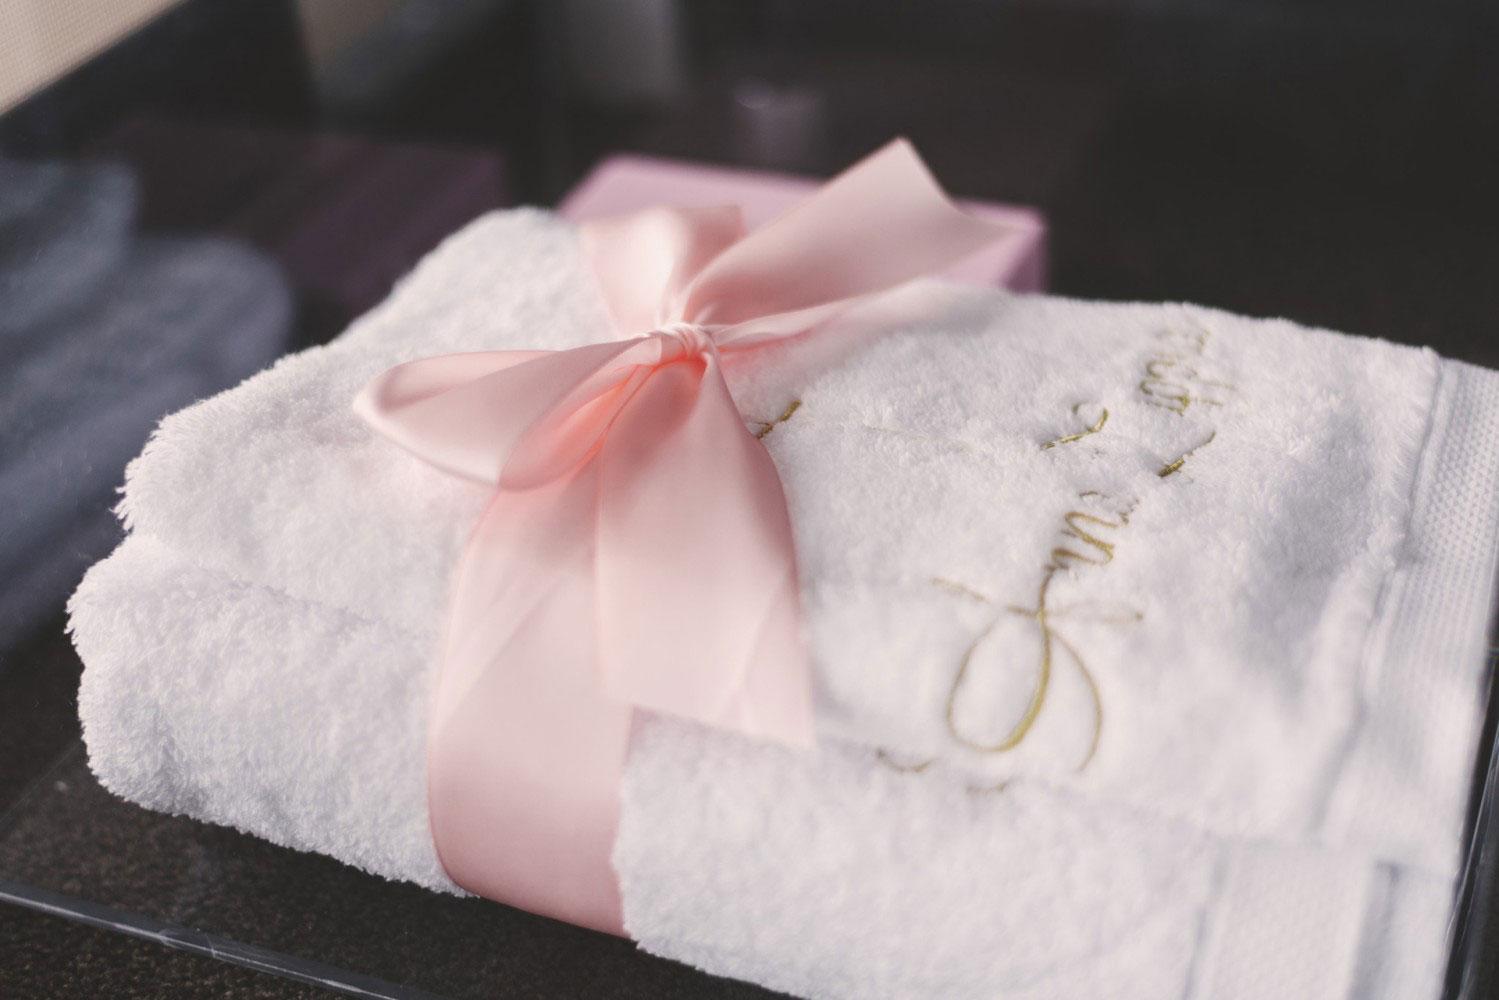 Jessica-Lemon-Photography-Adelaide-Wedding-Baptism-Christening-Engagment-Party-Event-Gift-Detail-Photographer.jpg